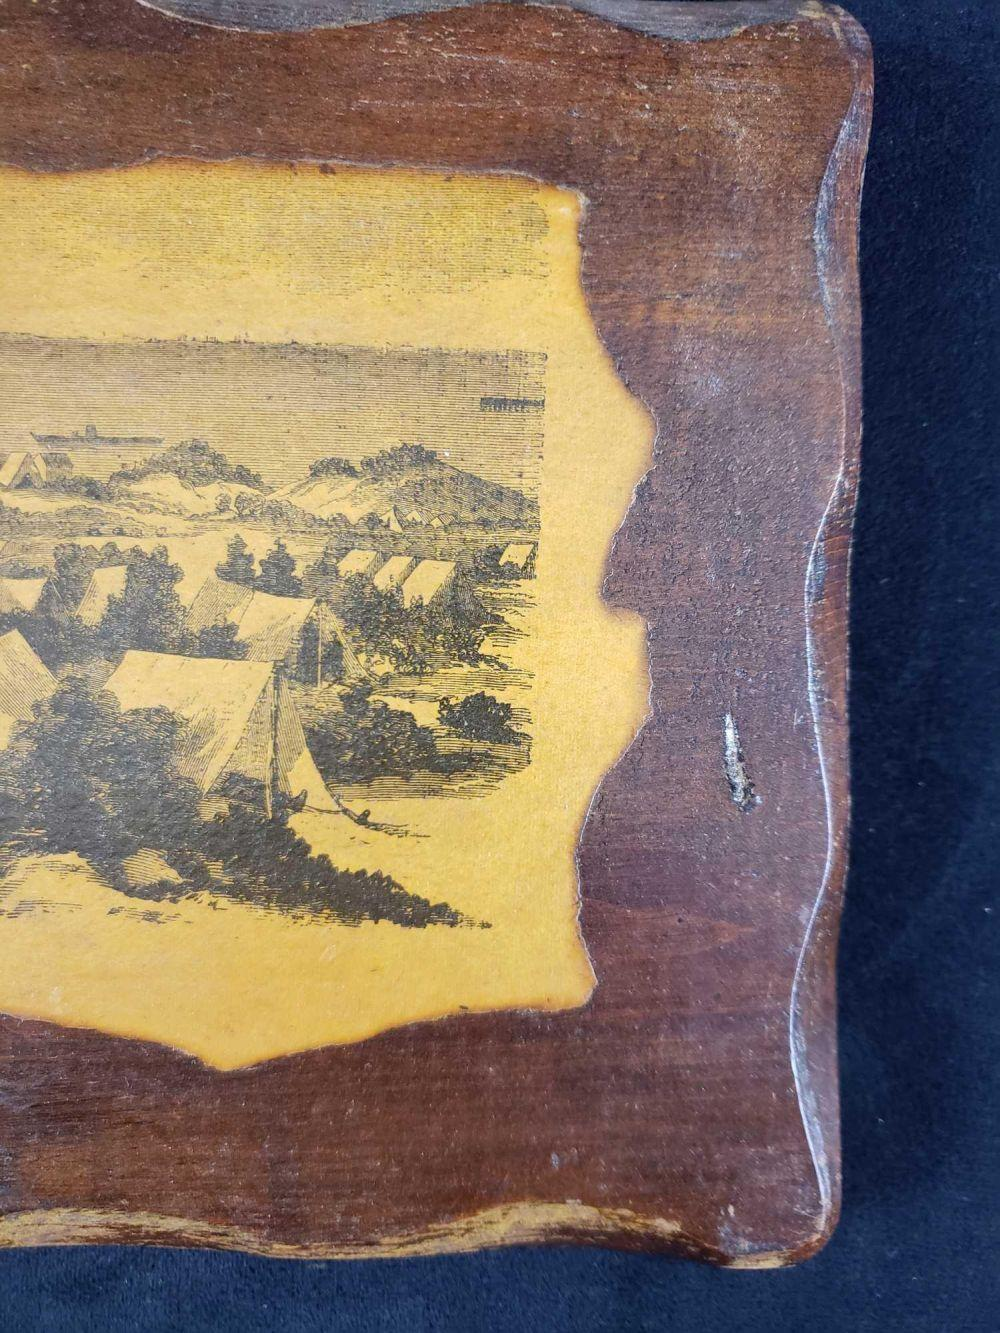 Lot 233: Civil War Decoupage Wall Art General Grangers Army in the Rear of Fort Morgan